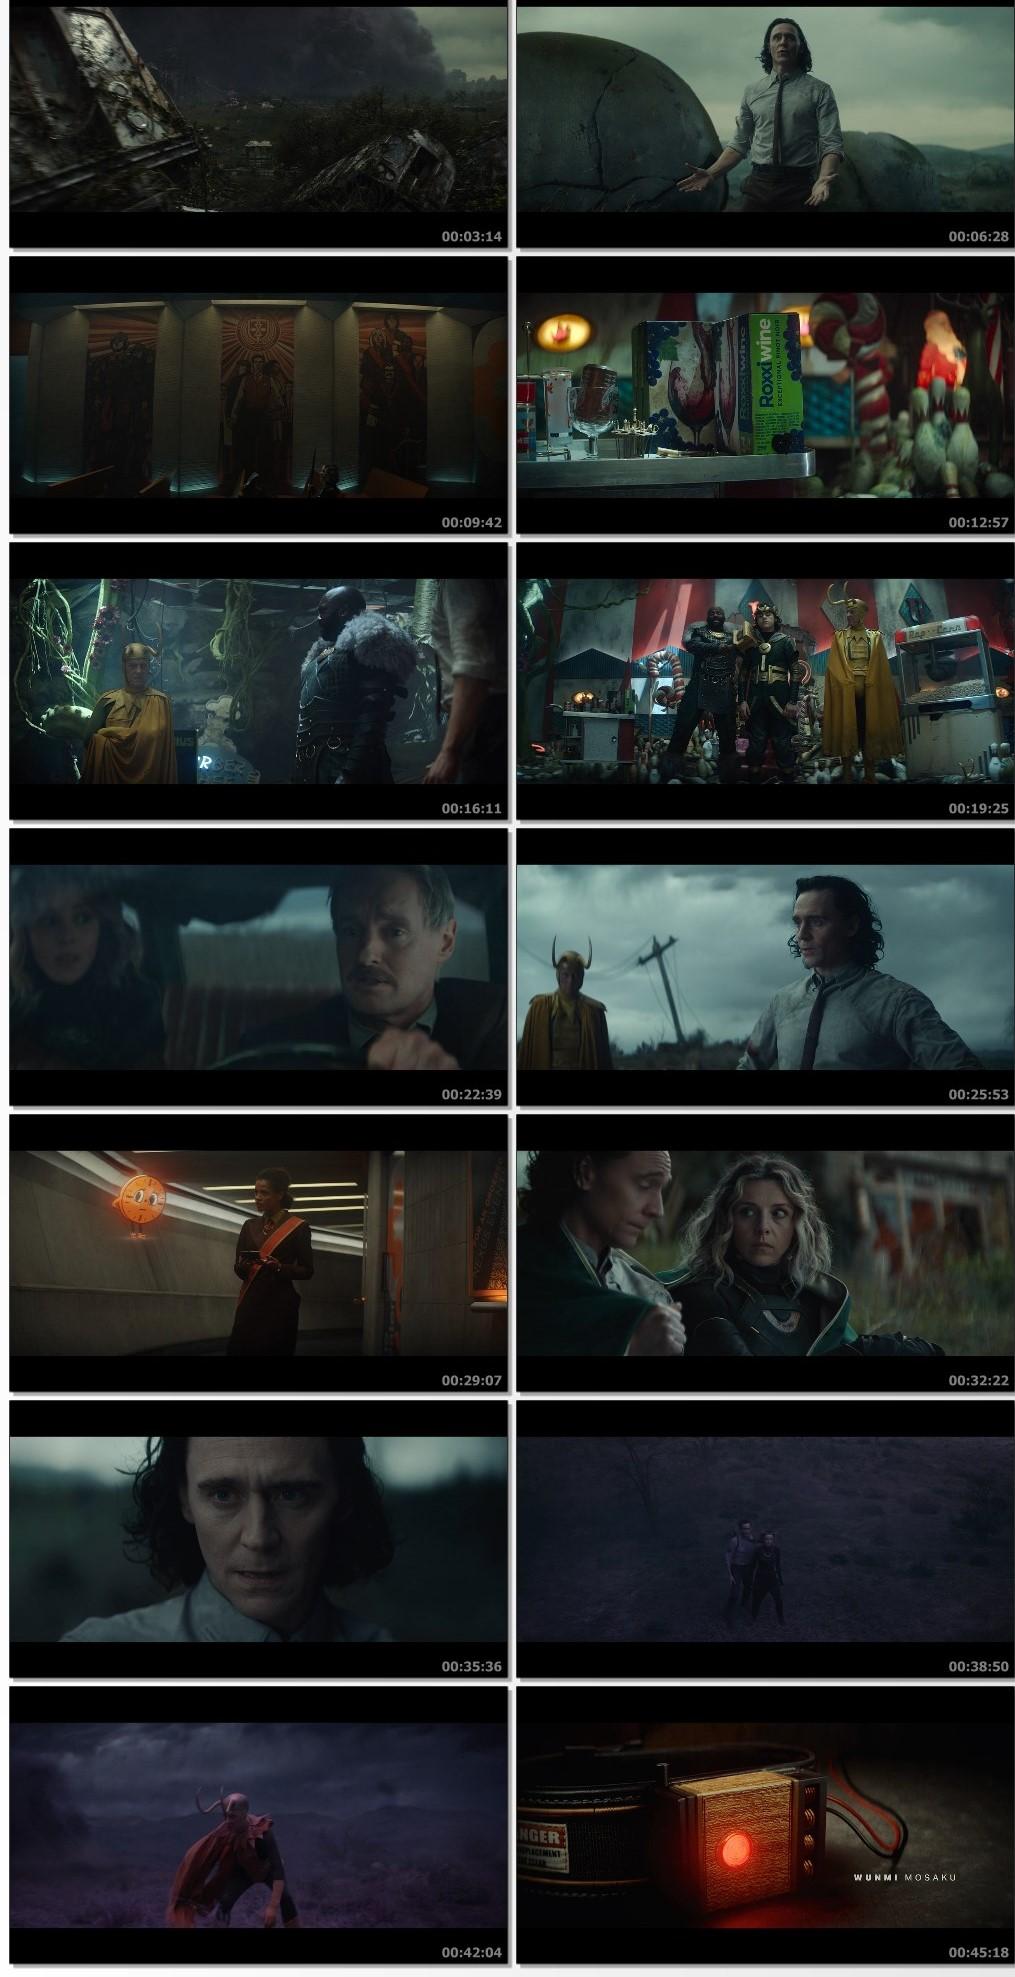 Loki-2021-S01-E05-Hindi-Dual-Audio-720p-HDRip-ESub-600-MB-mkv-thumbs28d1992265654bec